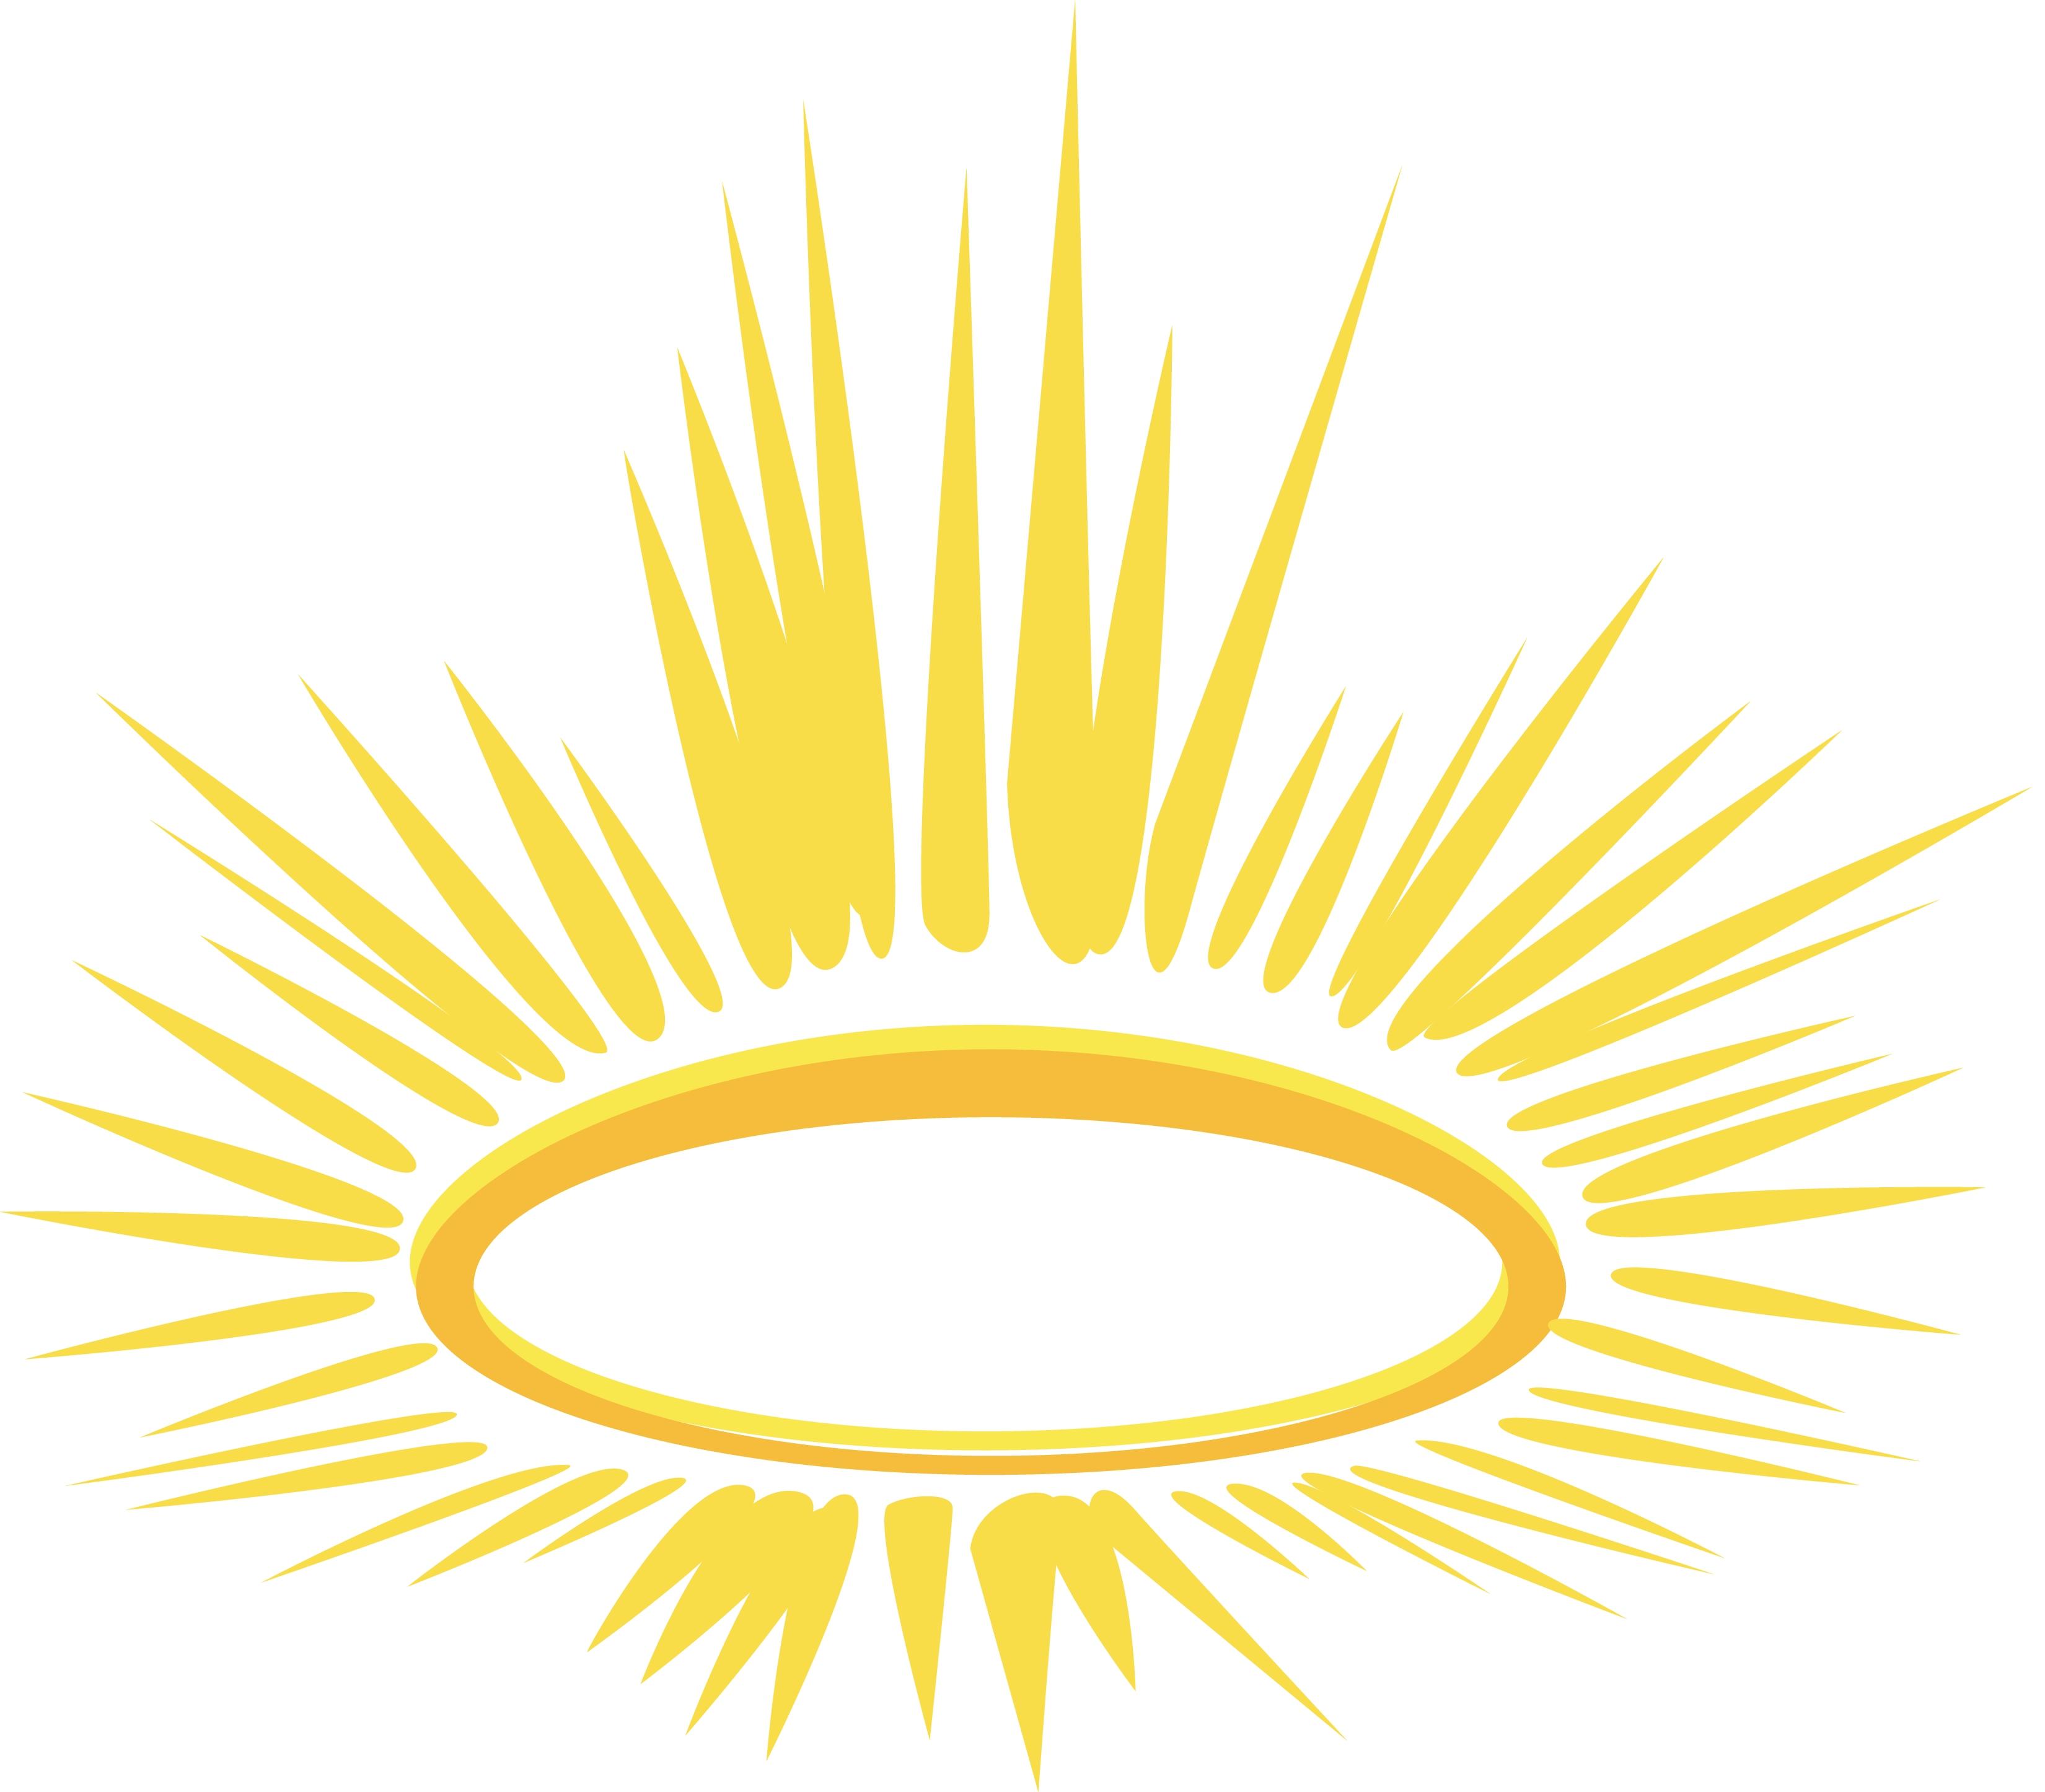 Heaven clipart spiritual Christian Catholic The Reasonable Pursuit